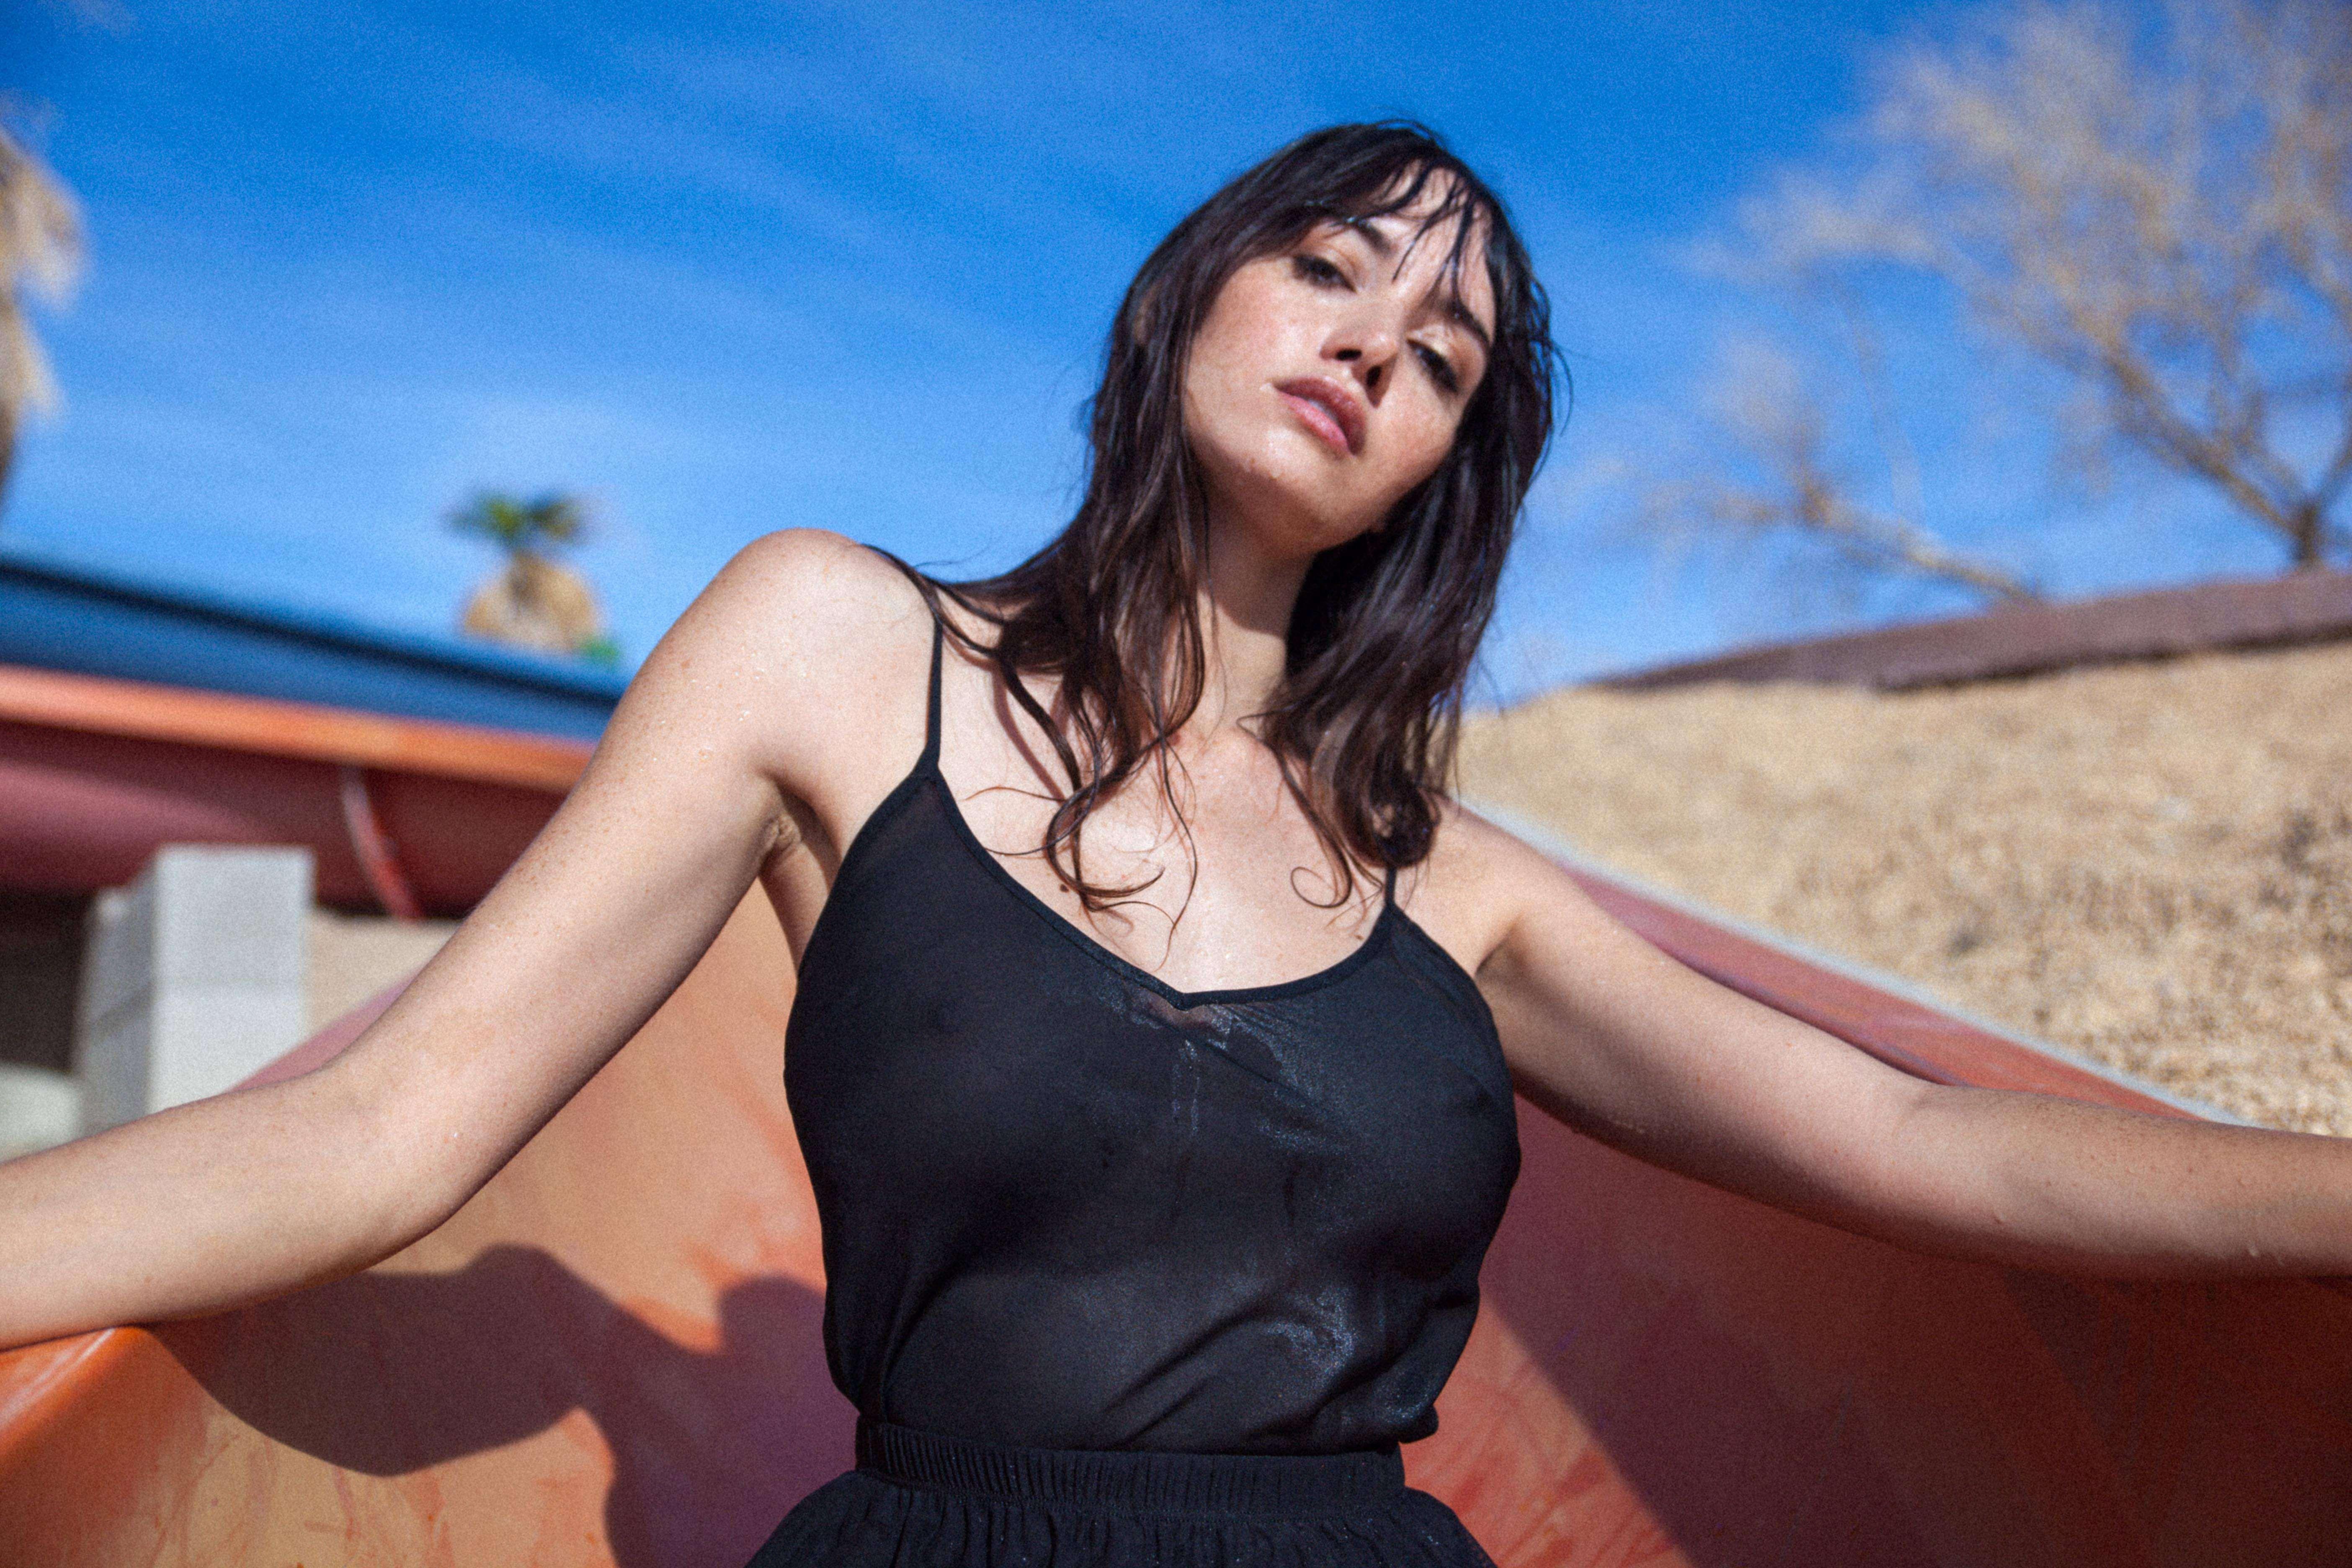 Hacked Sara Malakul nudes (35 foto and video), Tits, Cleavage, Twitter, panties 2006